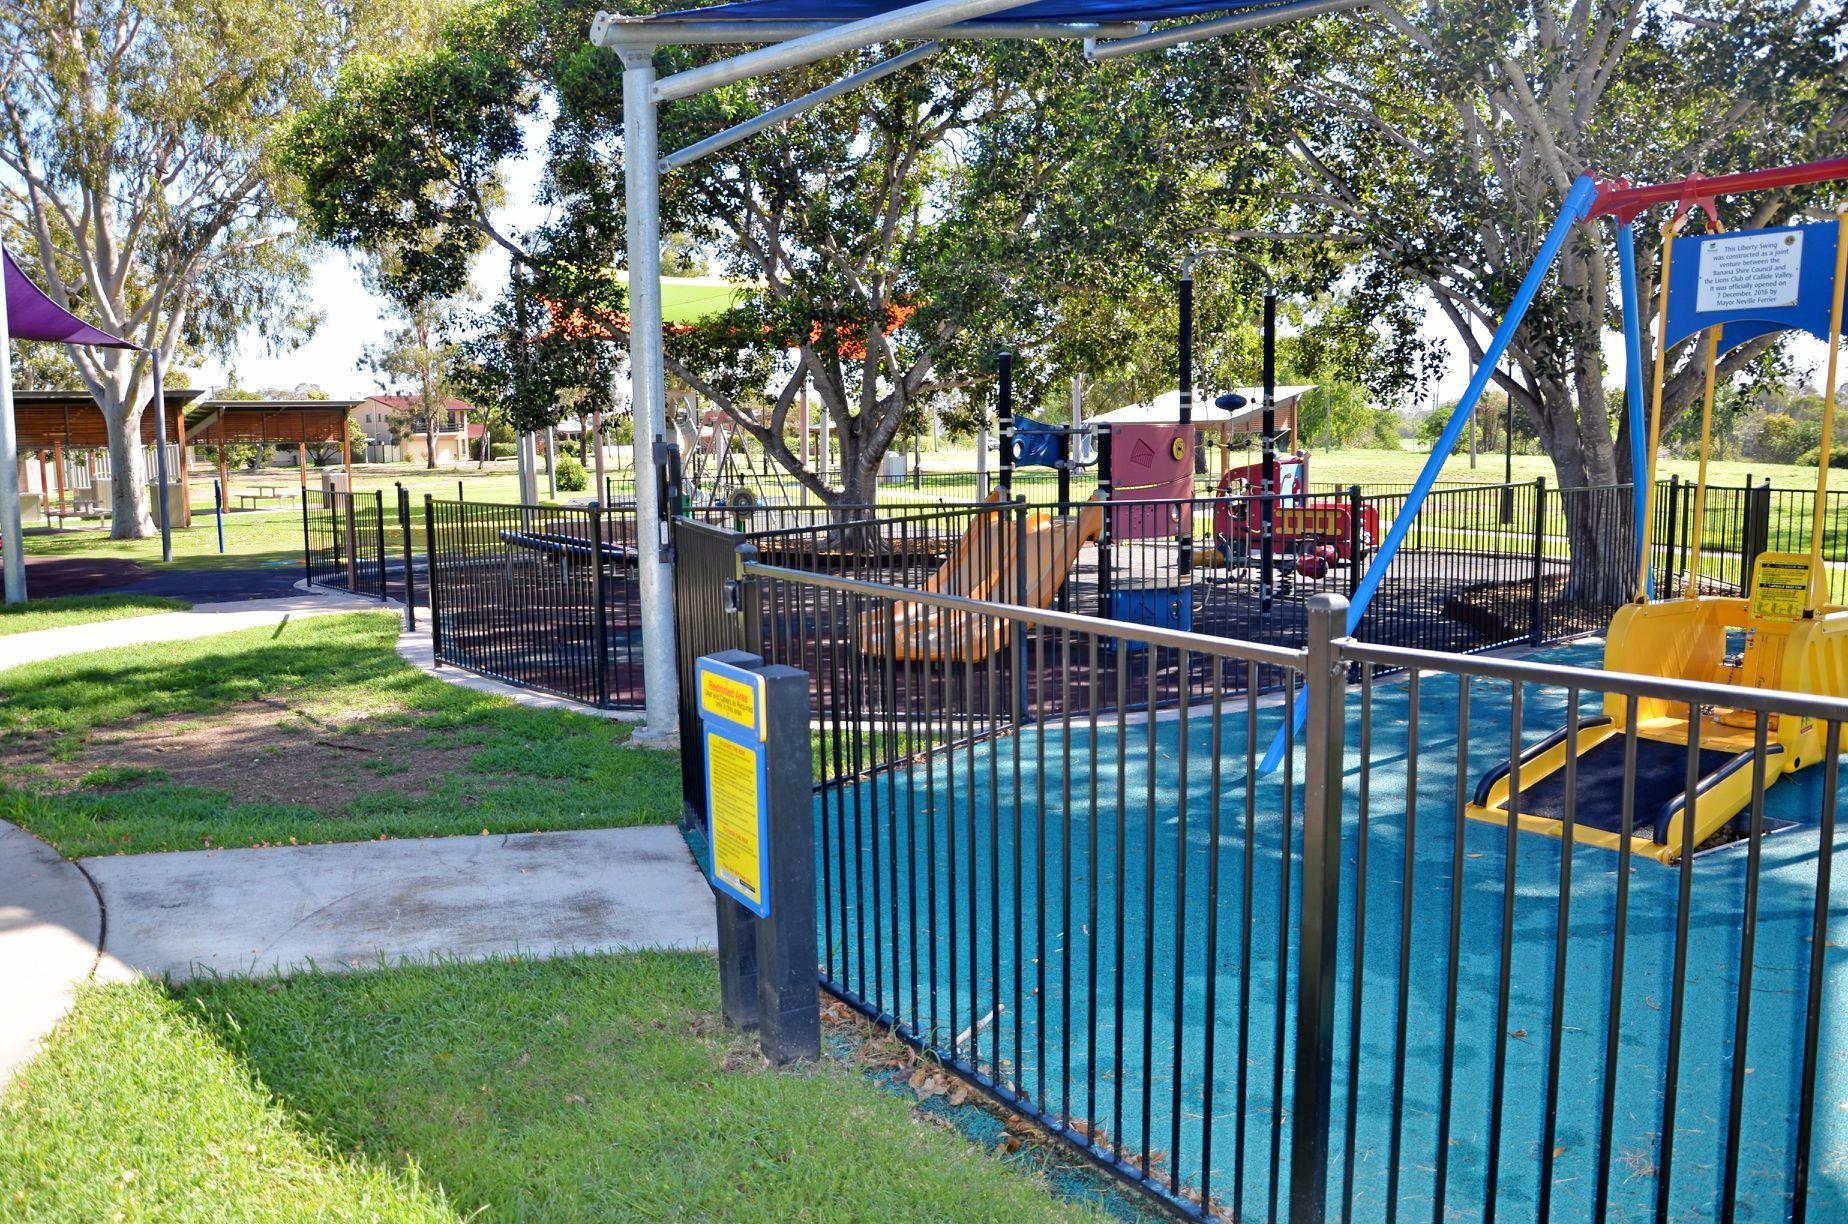 UNDER REPAIRS: The Biloela Lions Park will be going through repairs over the next three days.